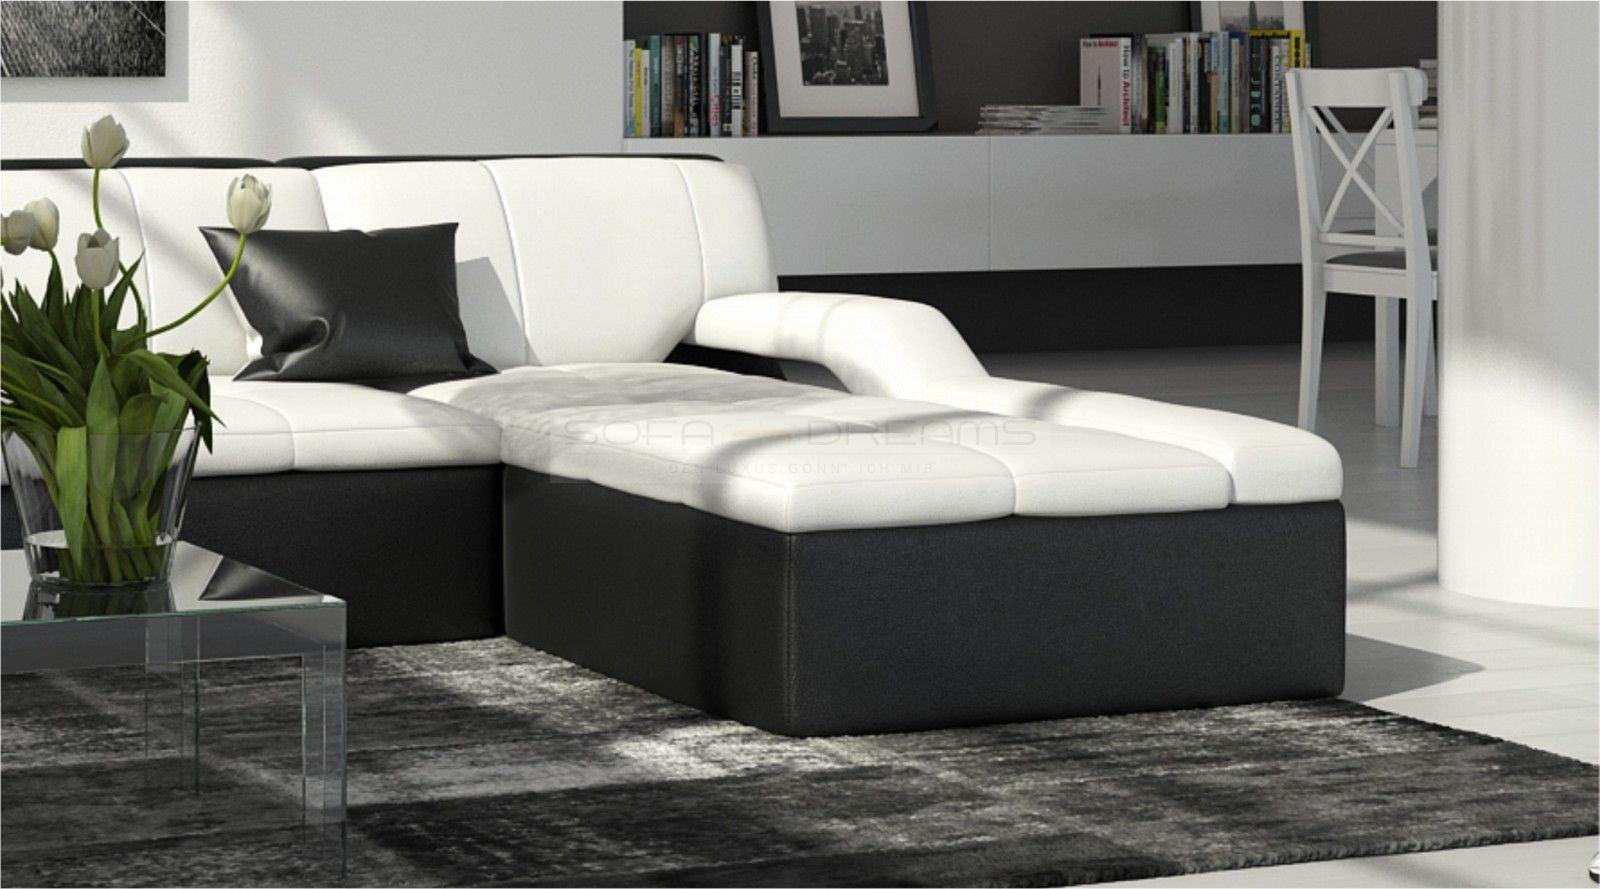 luxus wohnlandschaft guevara u form ecksofa designersofa ecksofa ebay. Black Bedroom Furniture Sets. Home Design Ideas